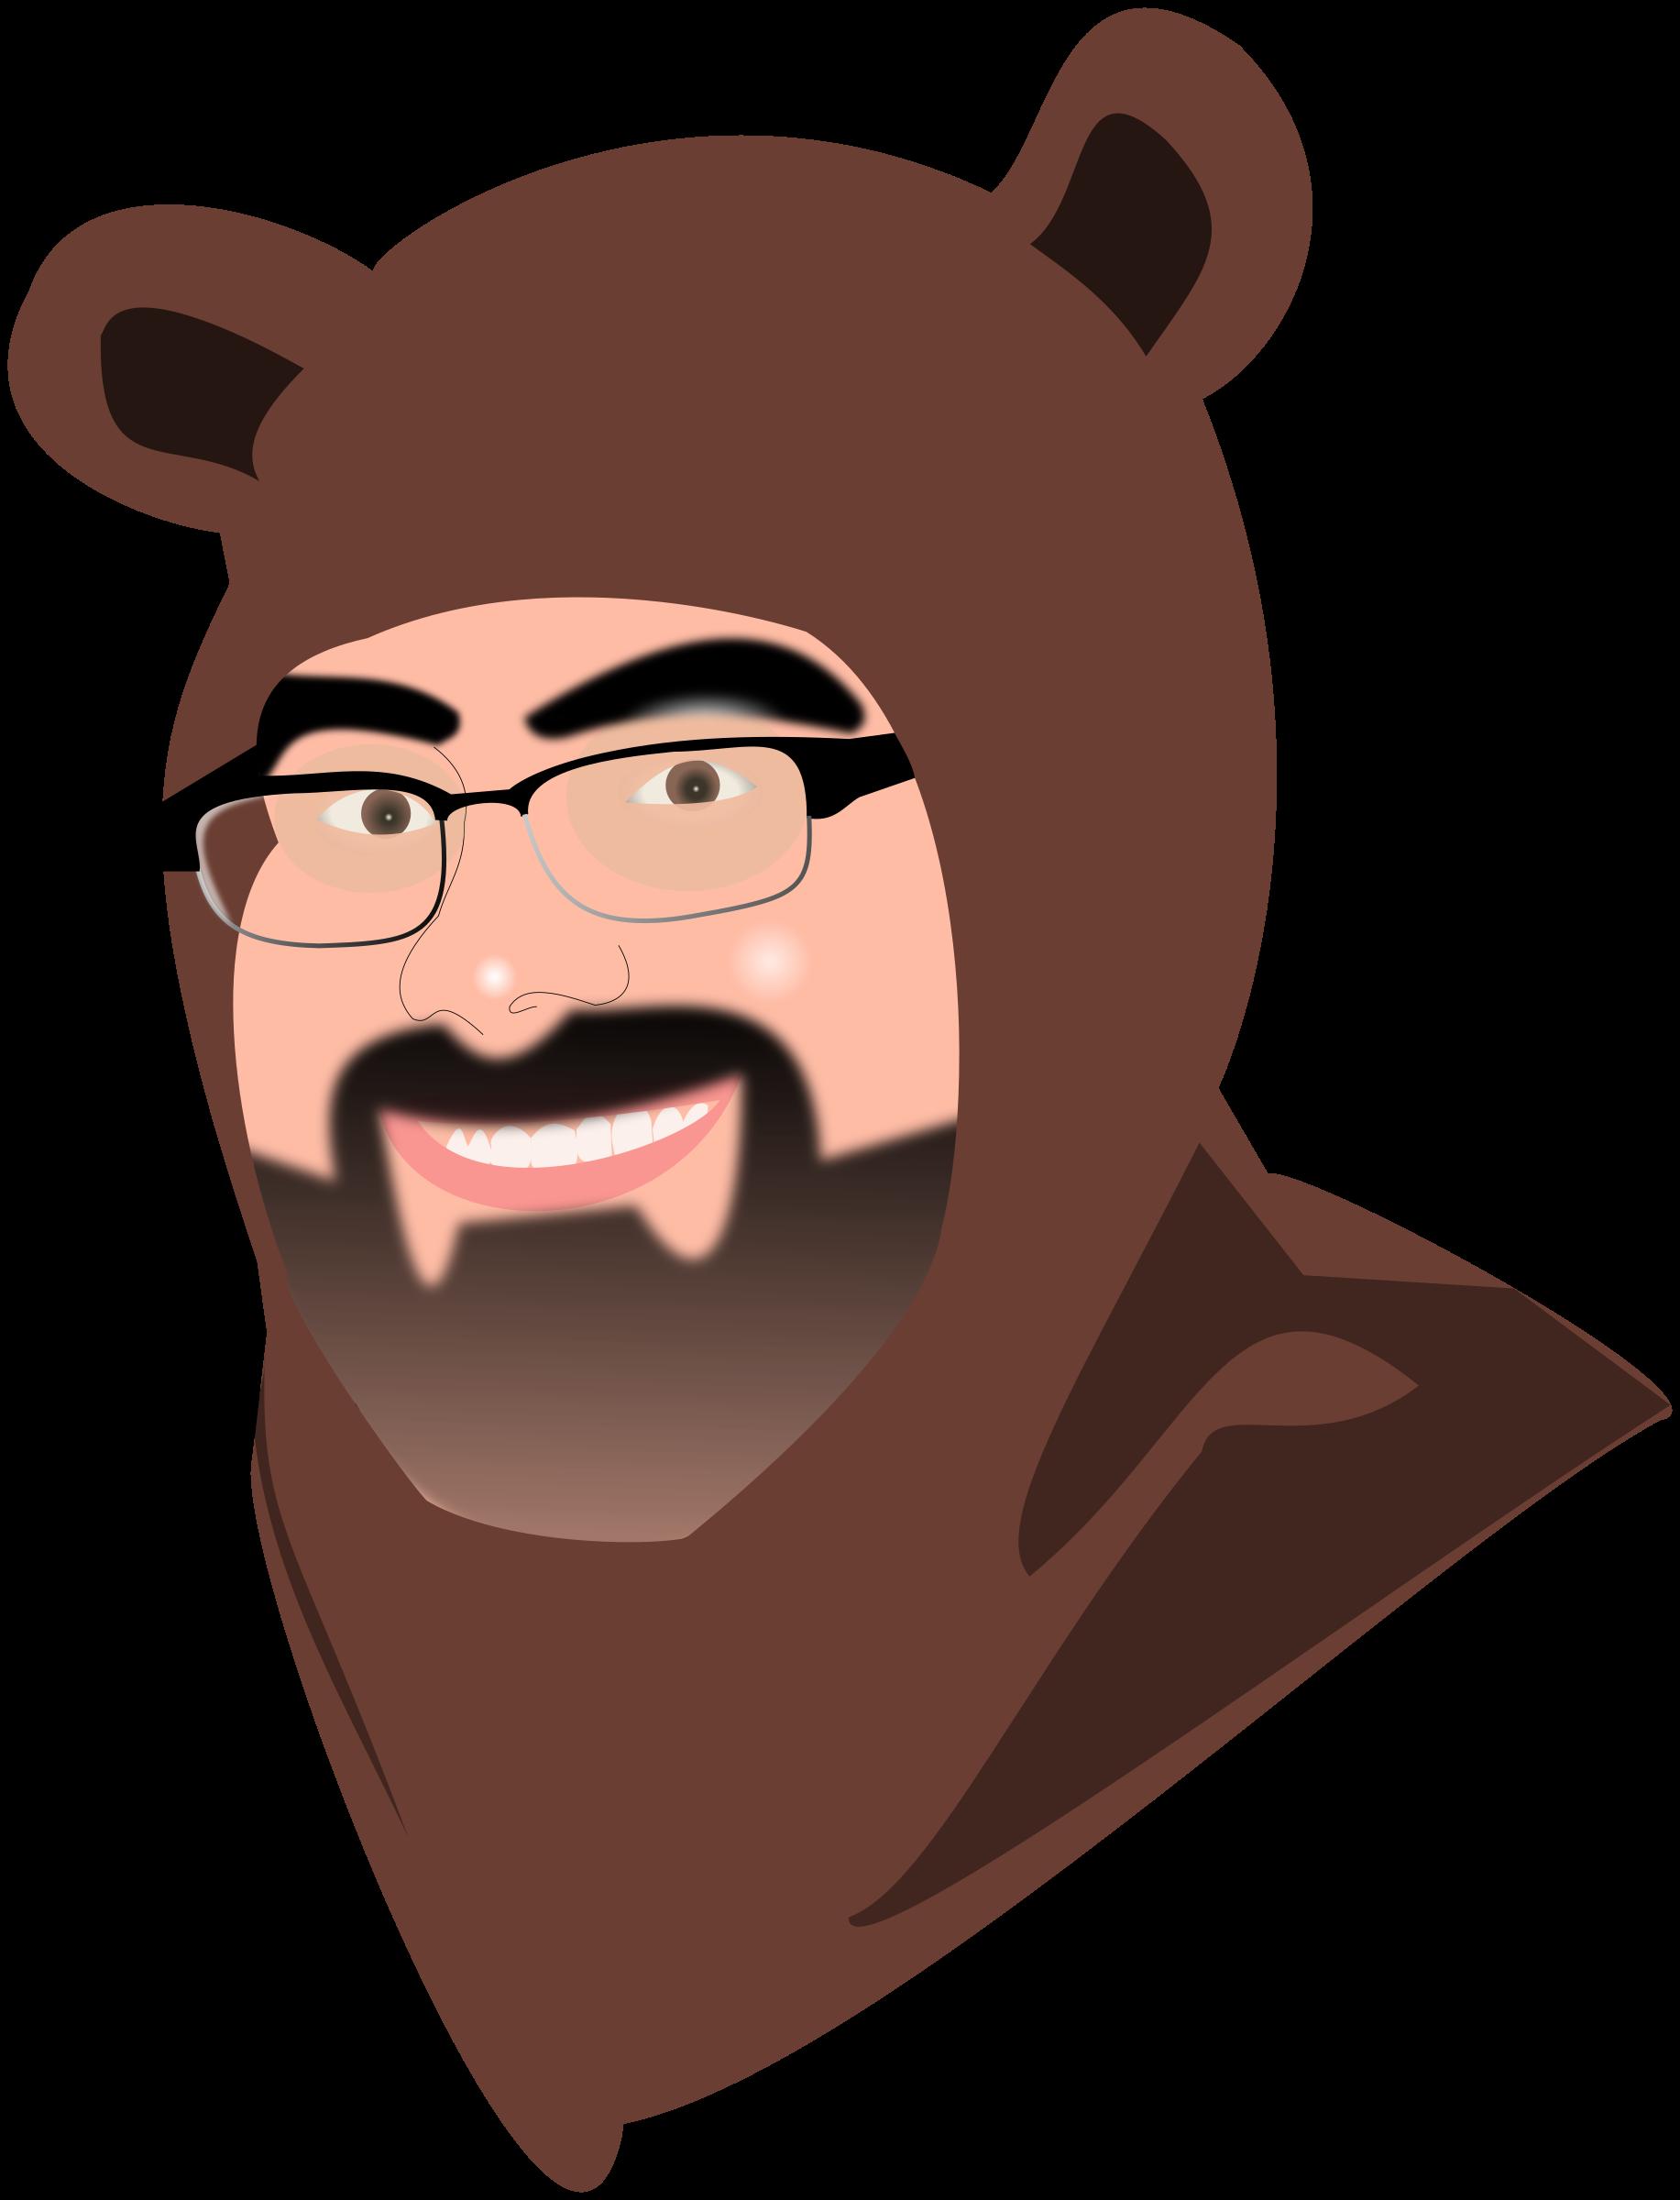 Furry clipart big bear #1